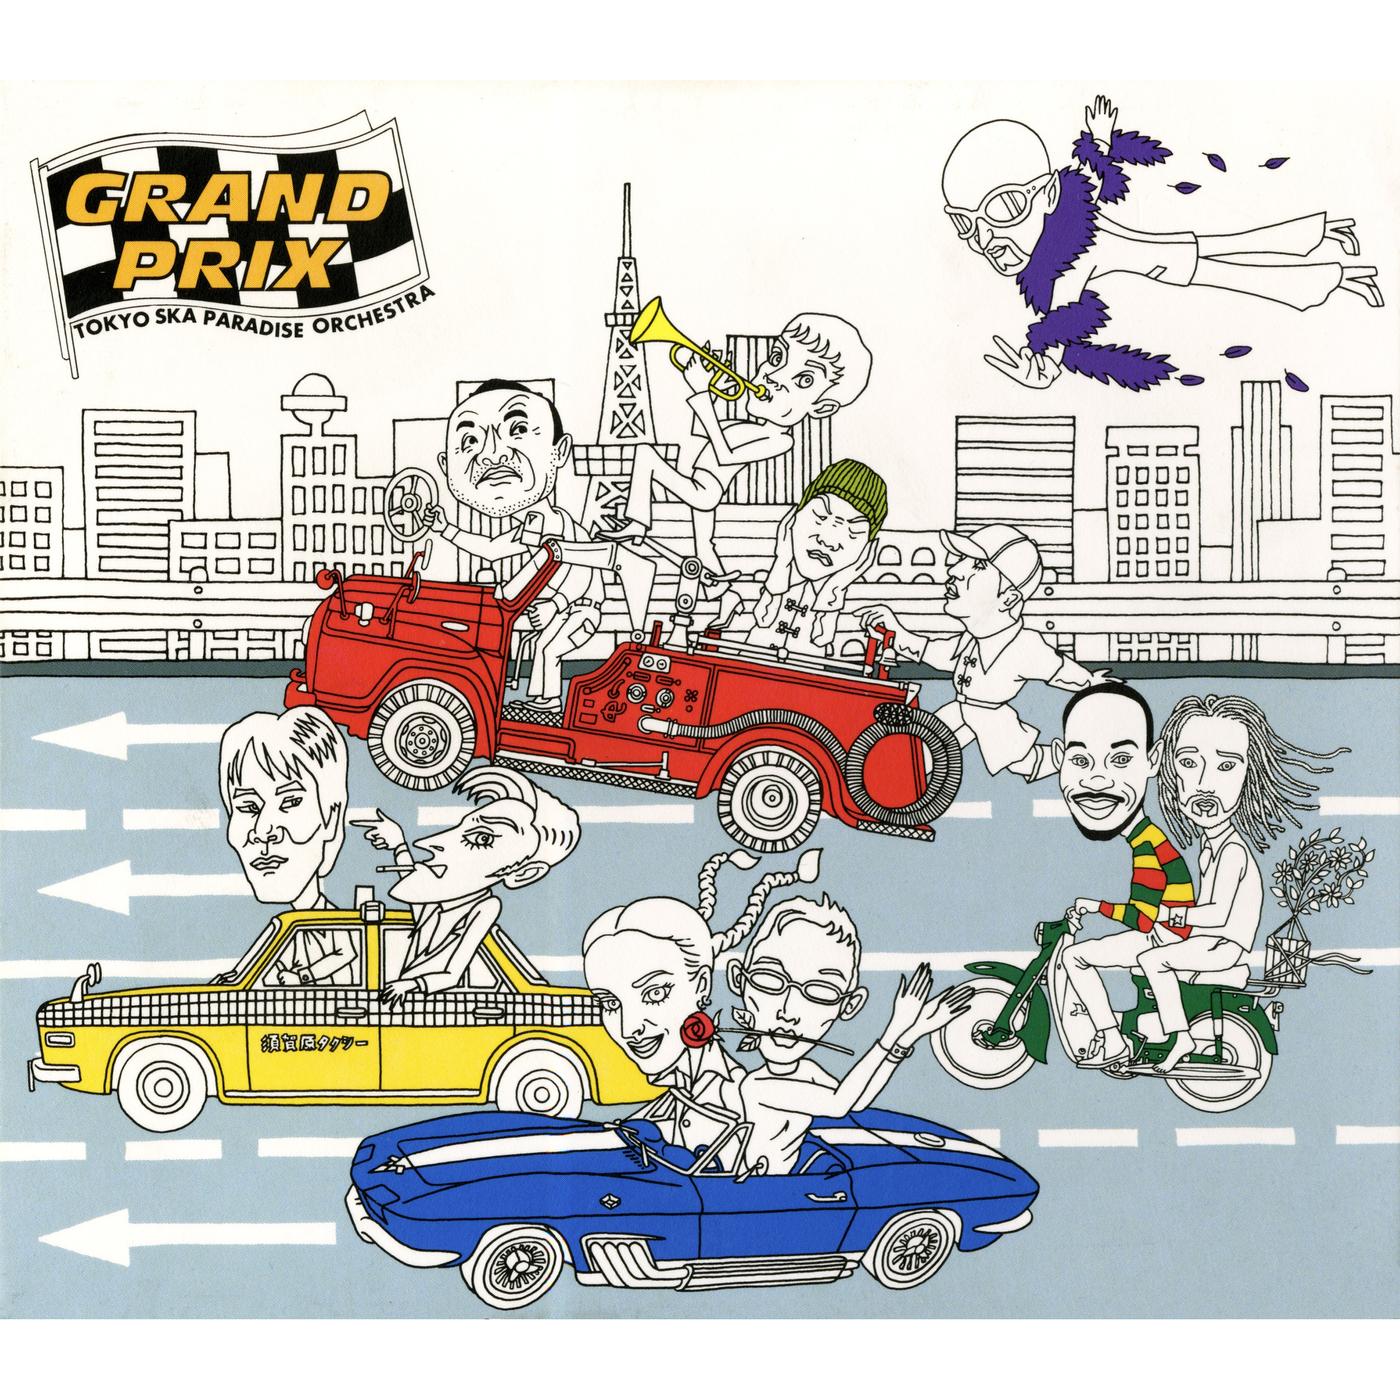 Grand Prix - Tokyo Ska Paradise Orchestra